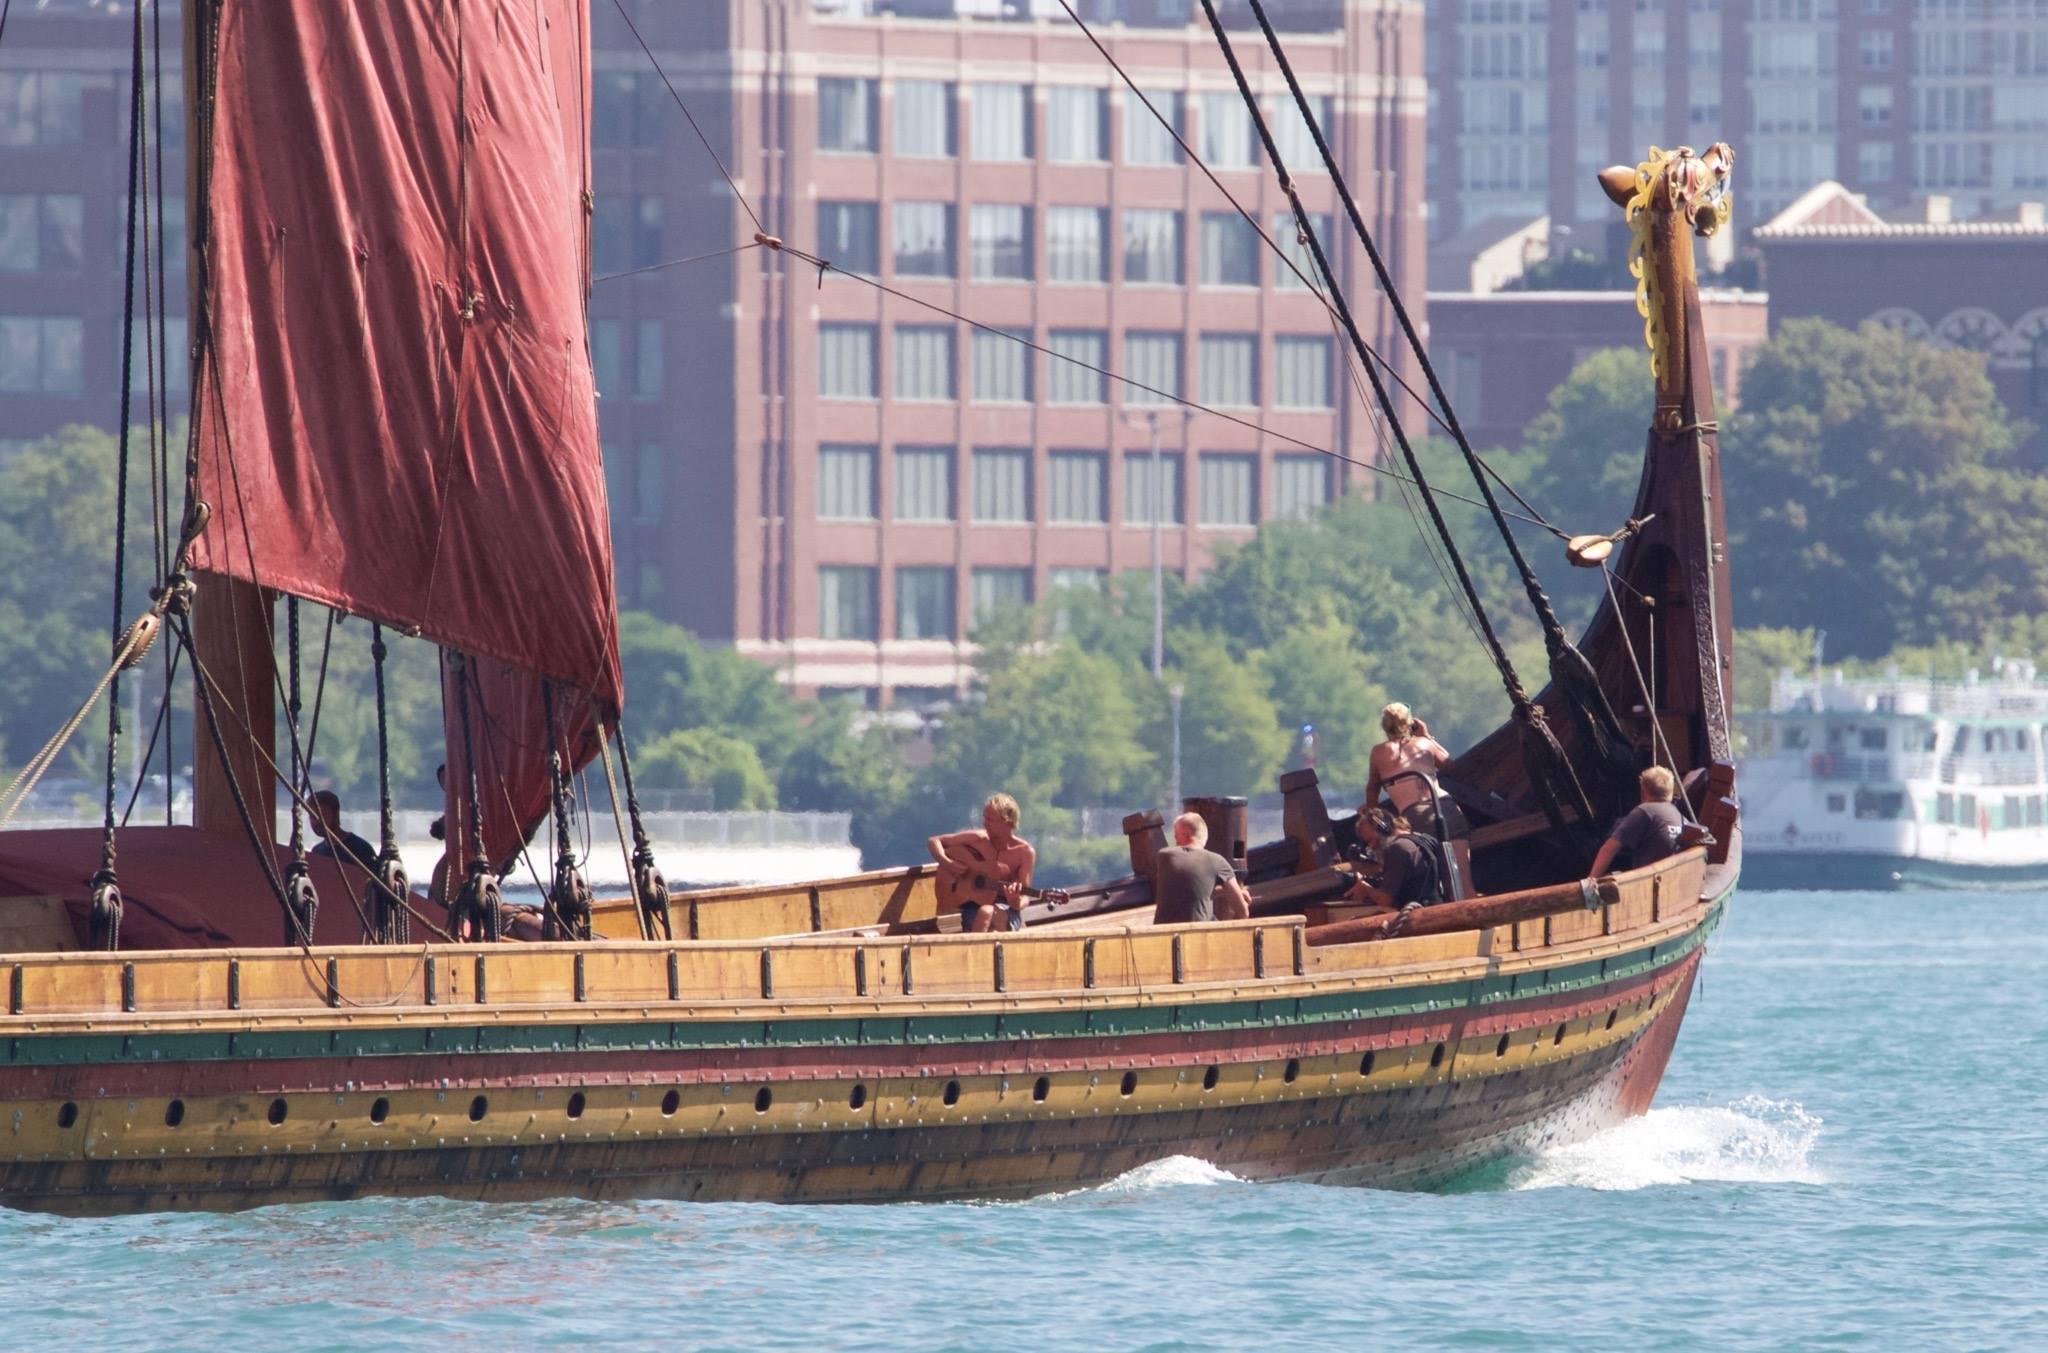 The Draken Harald Hrfagre As It Passed Detroit On July 13